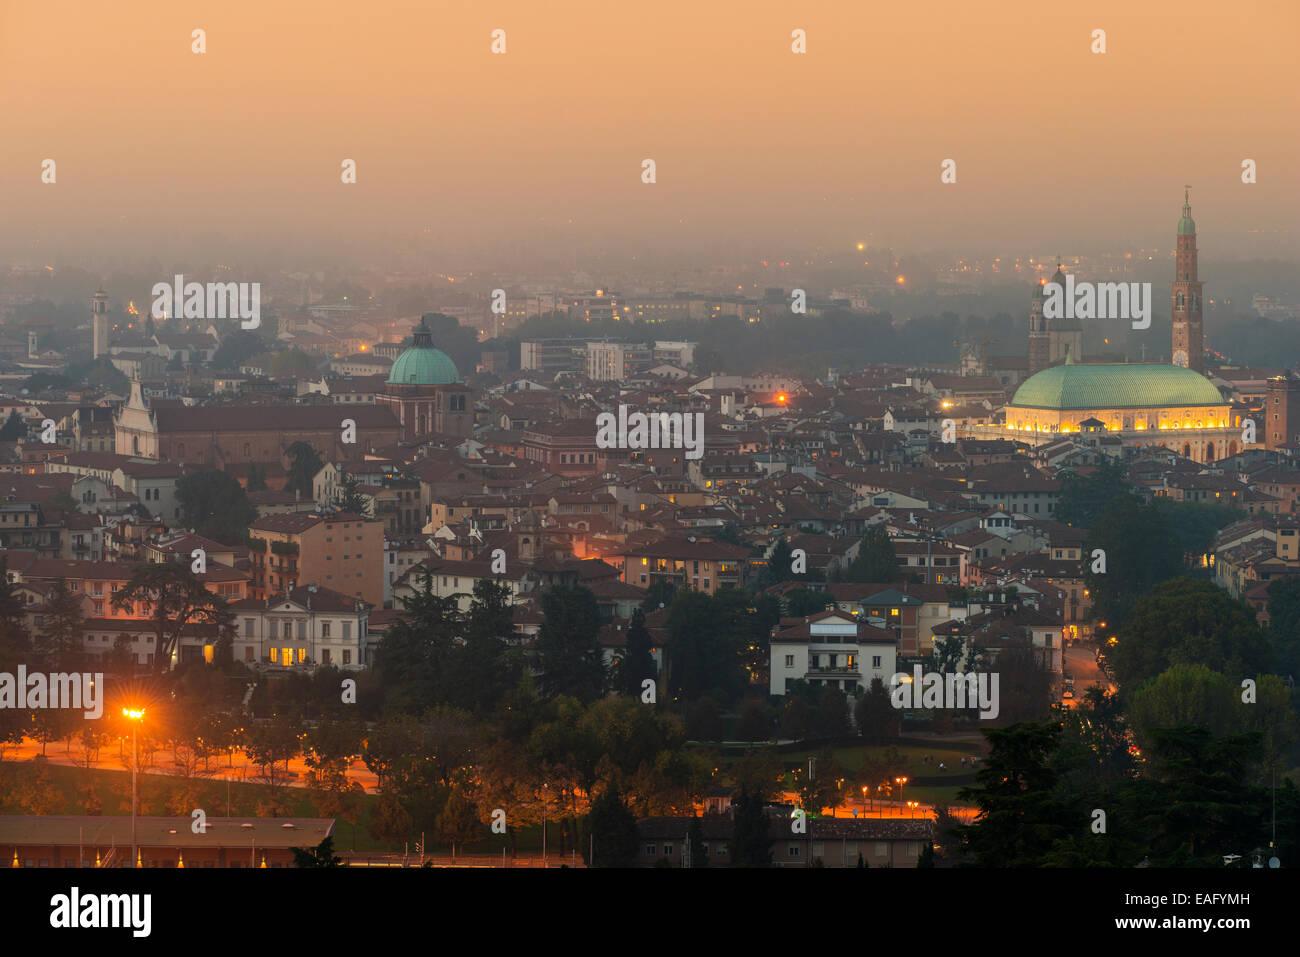 City skyline at sunset, Vicenza, Veneto, Italy - Stock Image